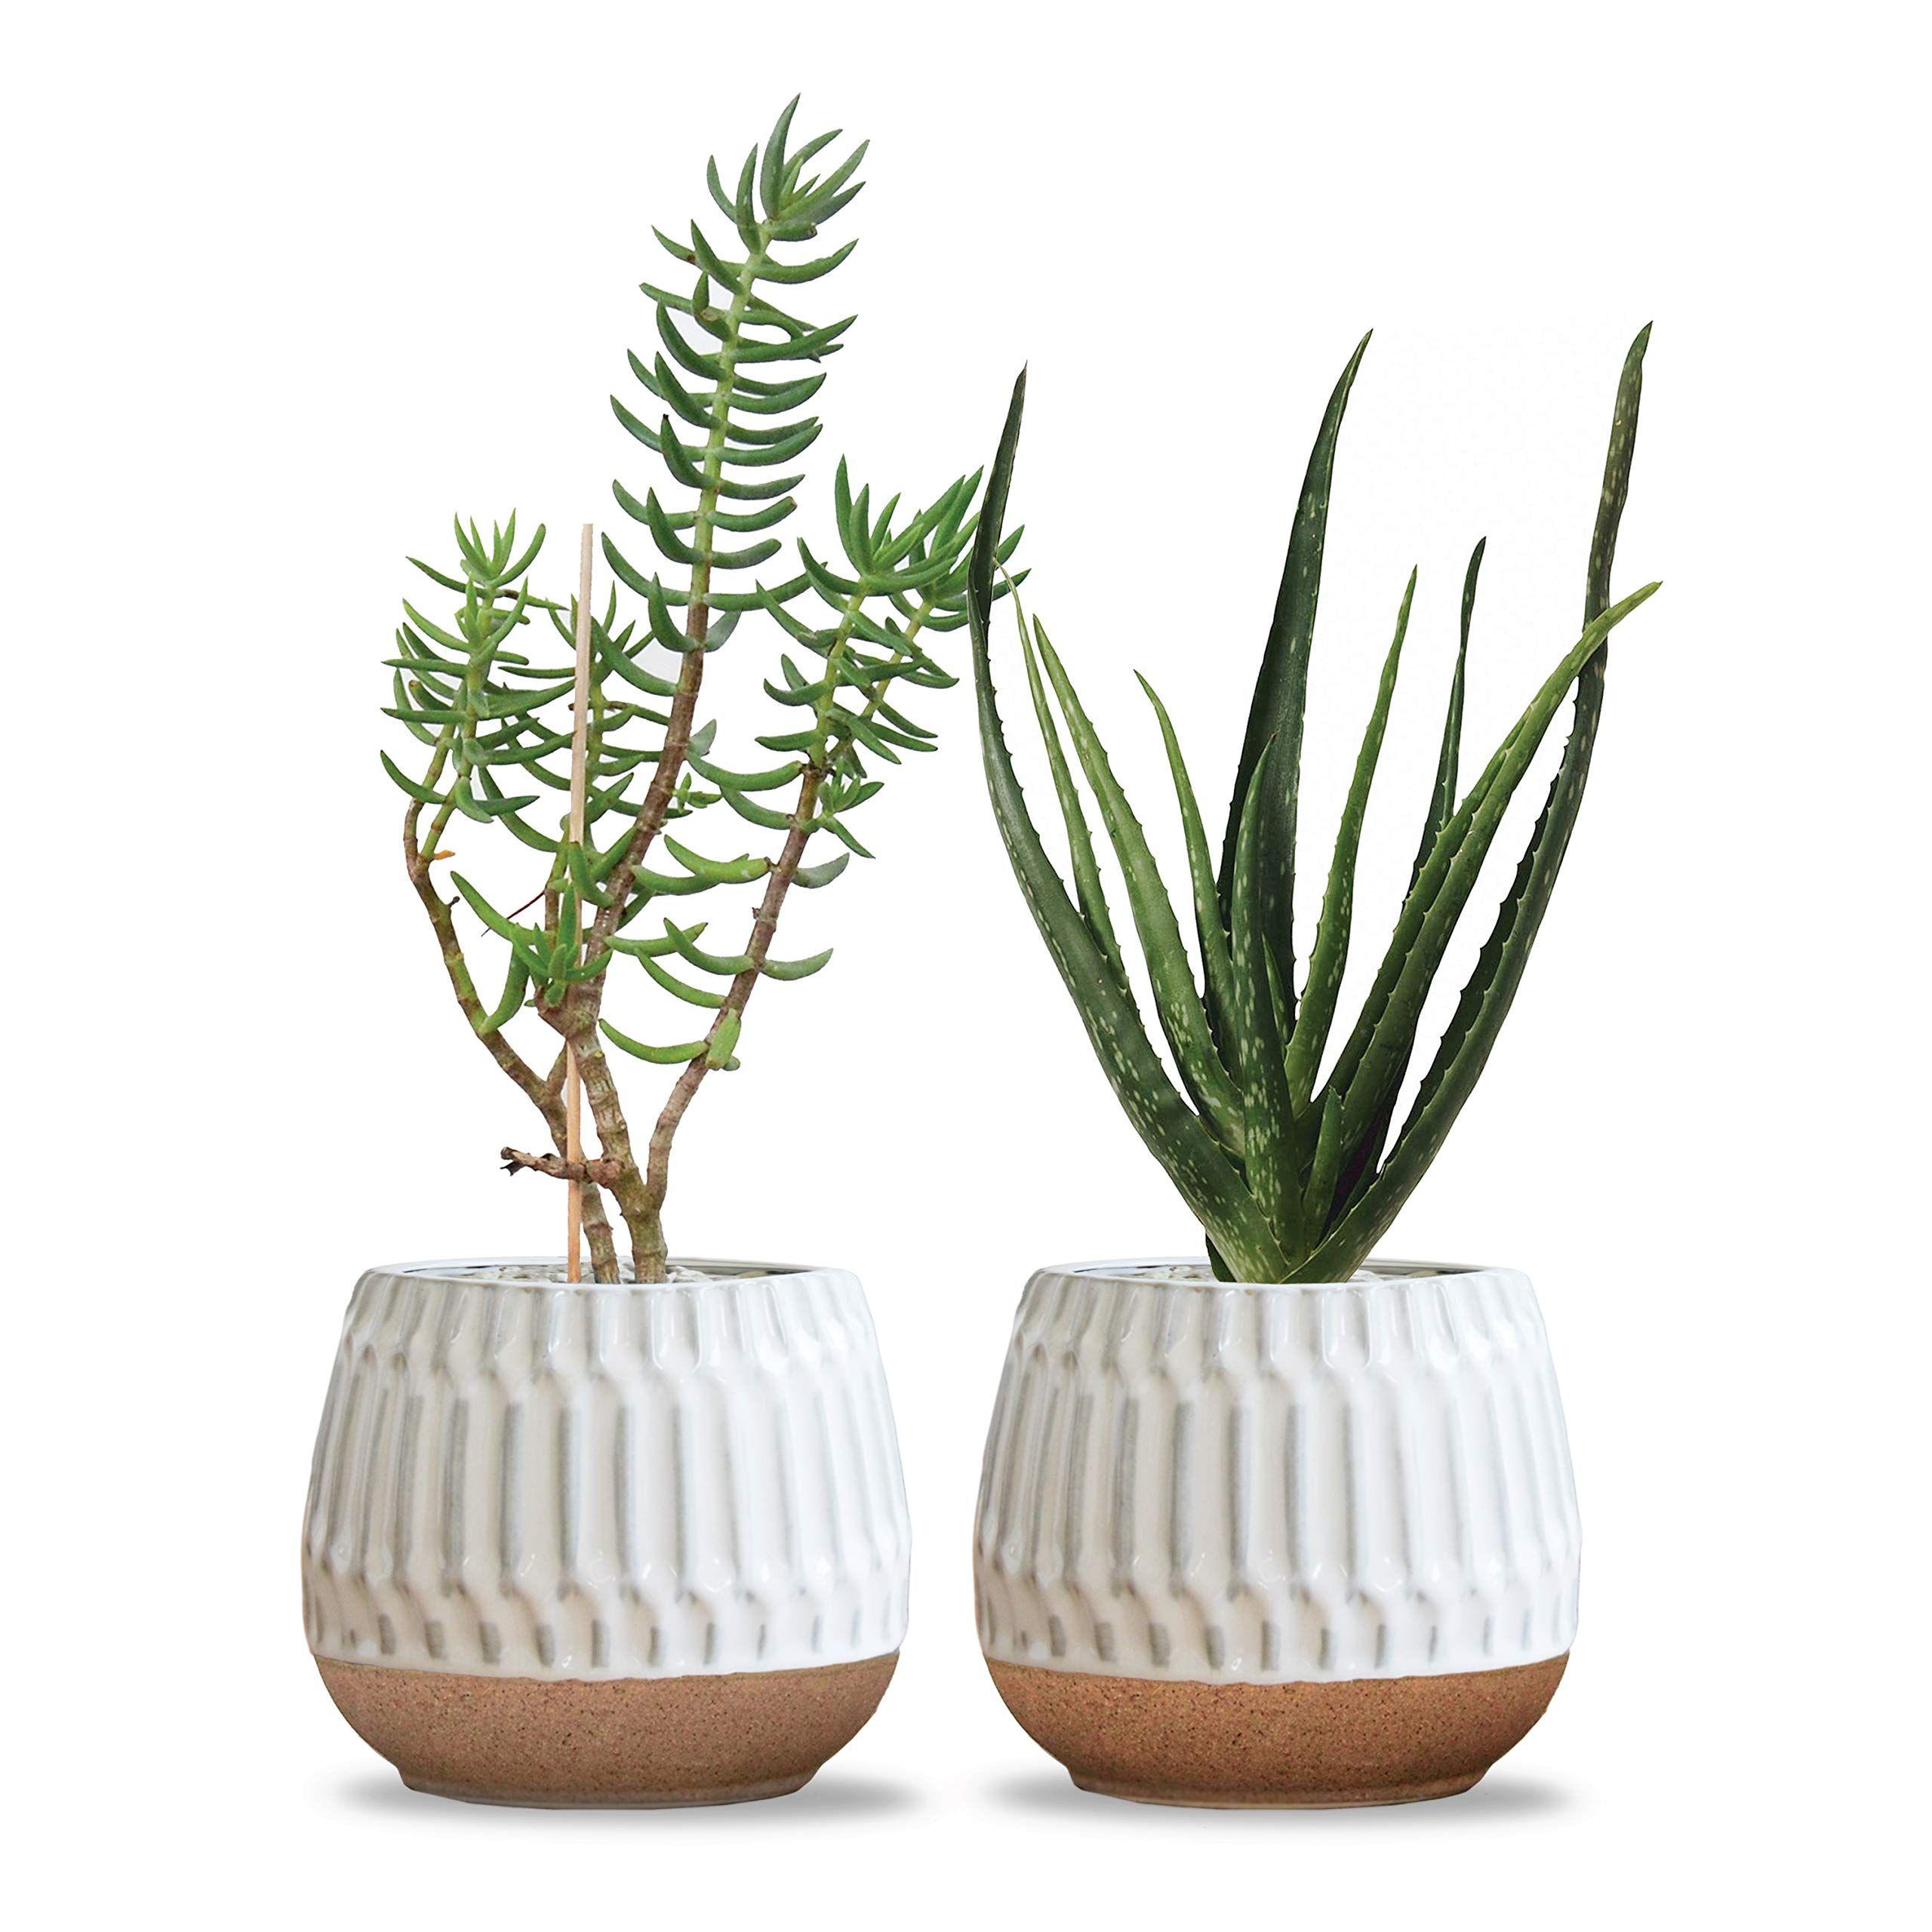 Carlton lane valencia ceramic indoor flower pots for